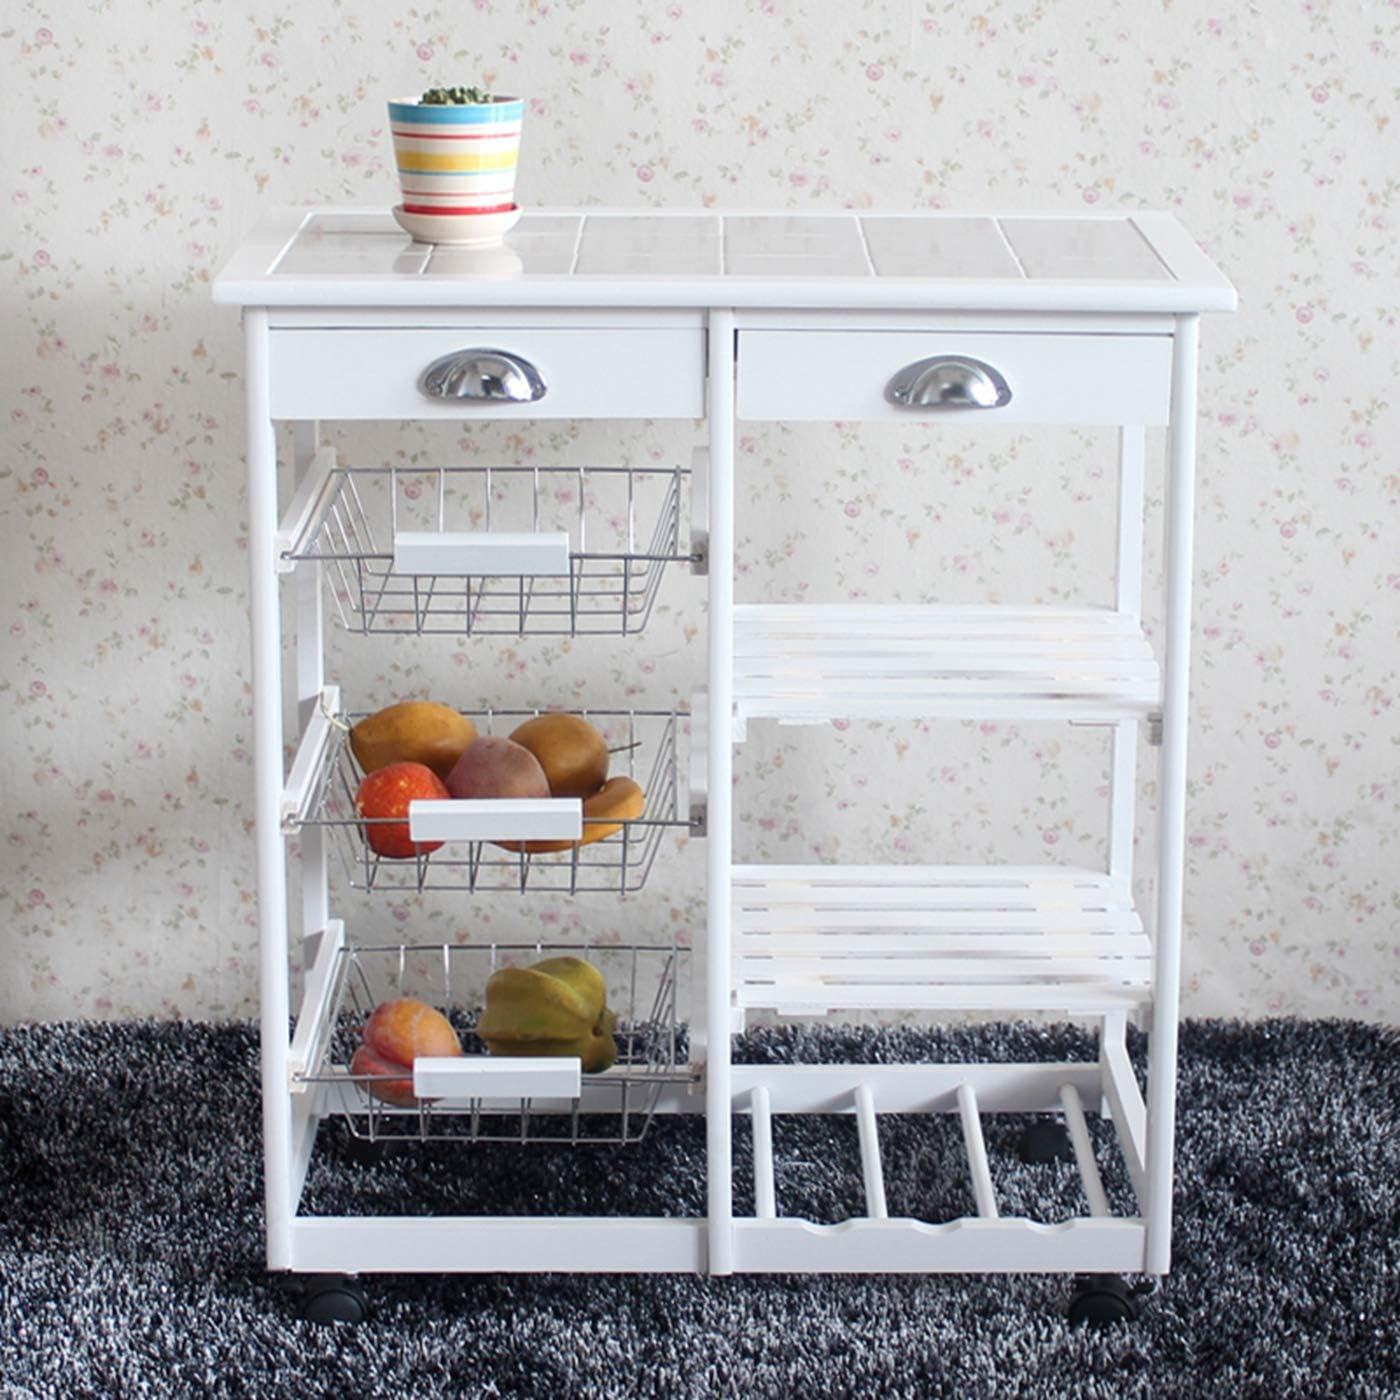 LeafRed C Kitchen & Dining Room Cart 2-Drawer 3-Basket 3-Shelf Storage Rack with Rolling Wheels Heavy Duty Shelving Storage Unit White